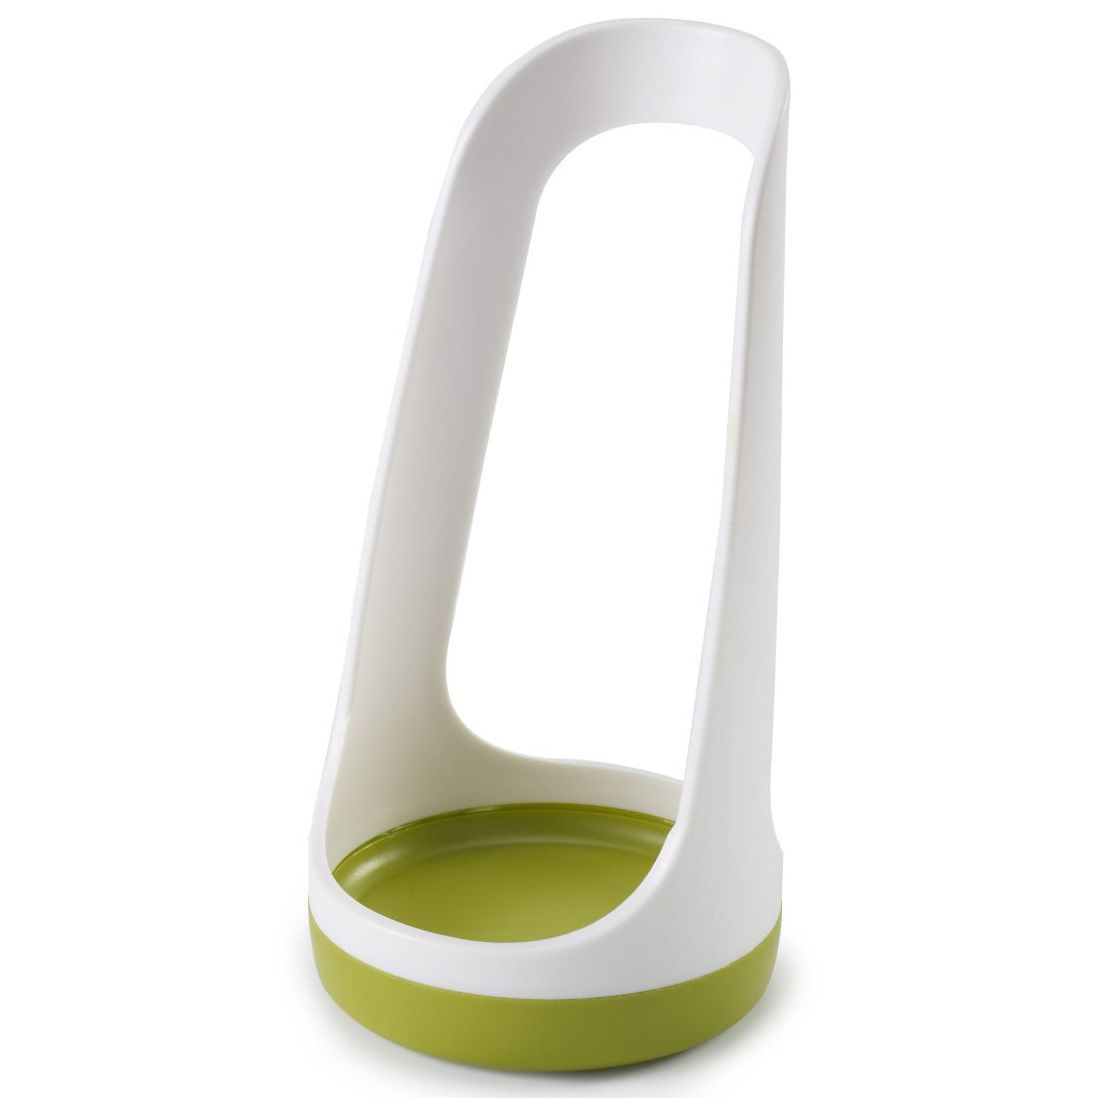 Подставка Joseph Joseph SpoonBase бело-зеленая для ложки или лопатки